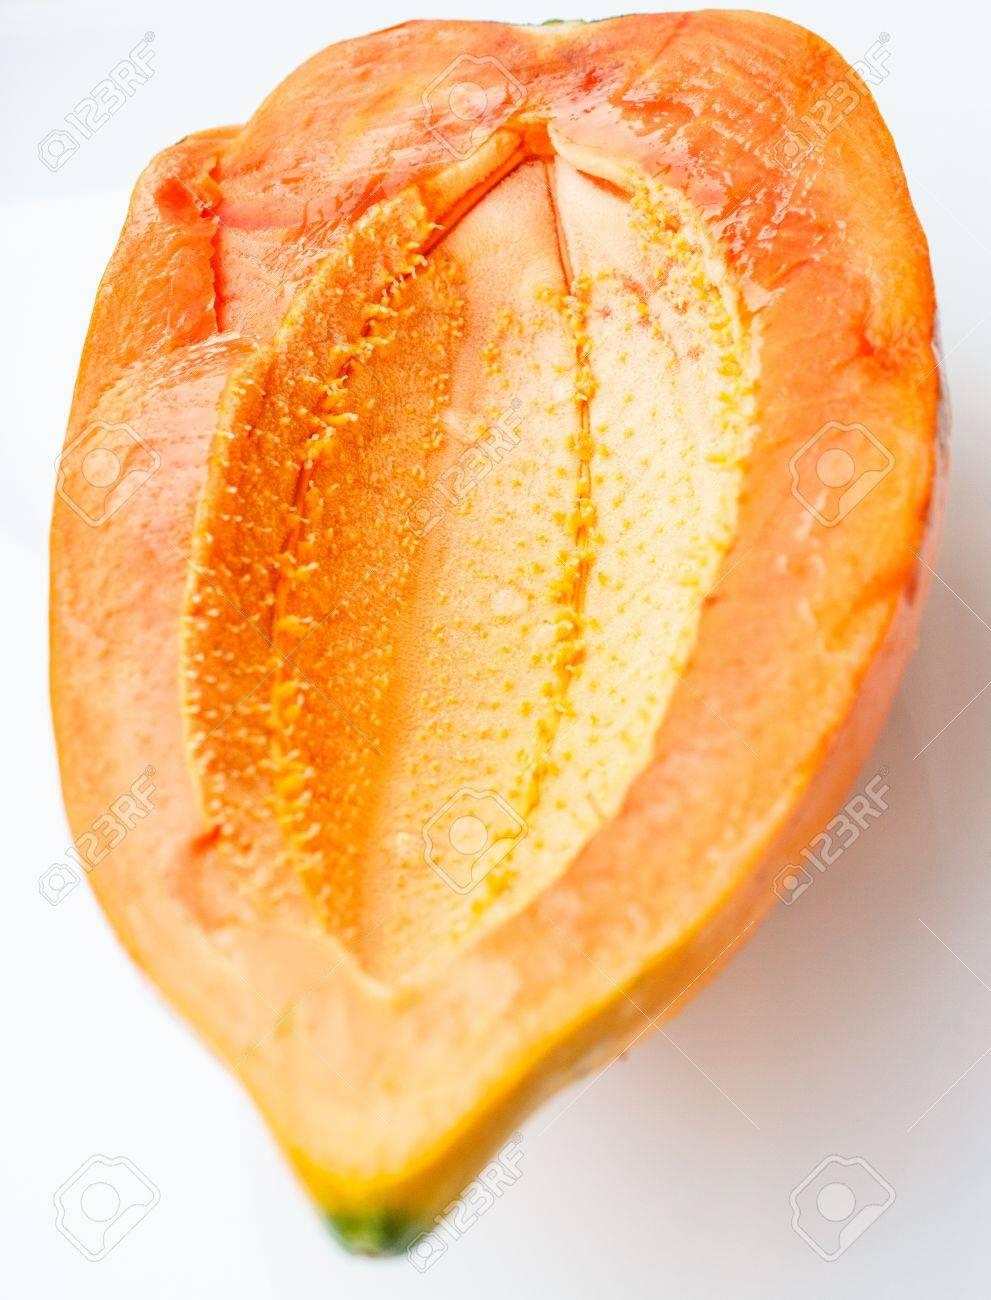 Ripe papaya peel it and eat Stock Photo - 18691547